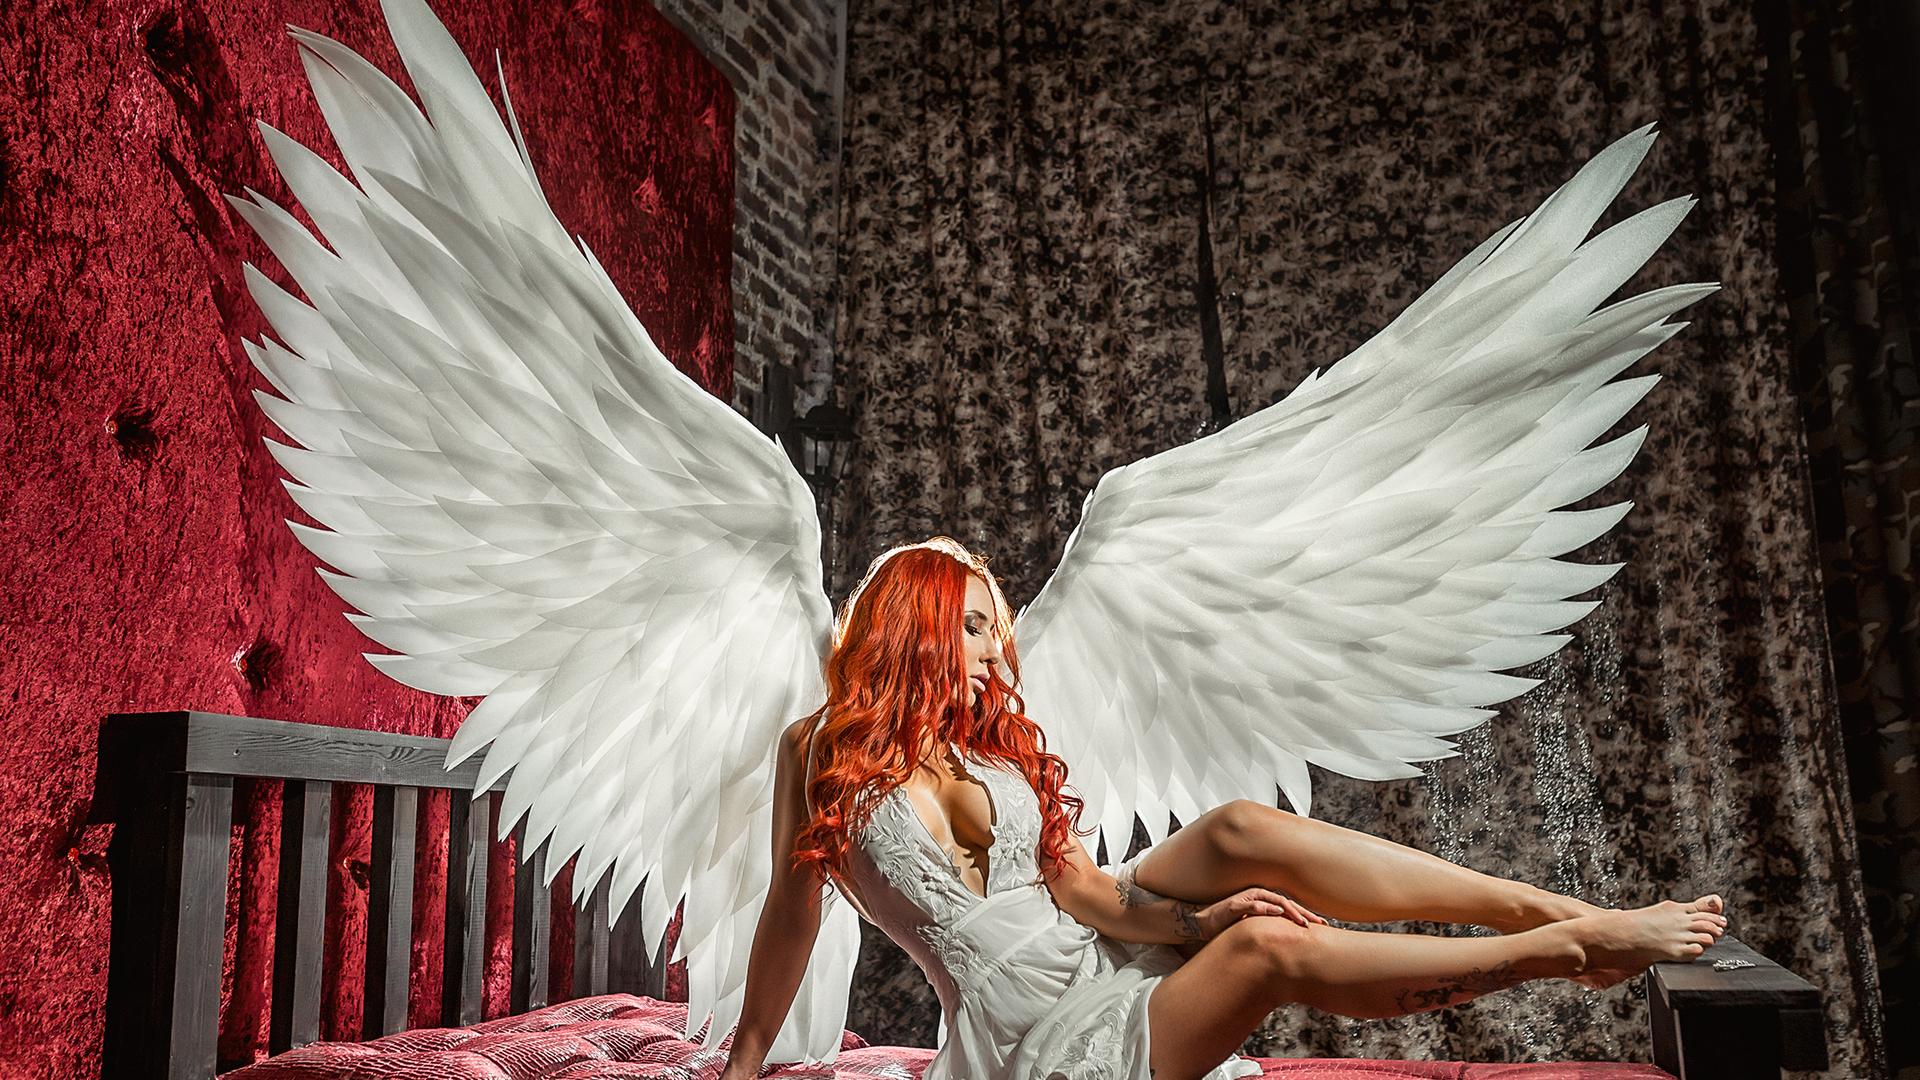 Картинки девушек ангелов на обои